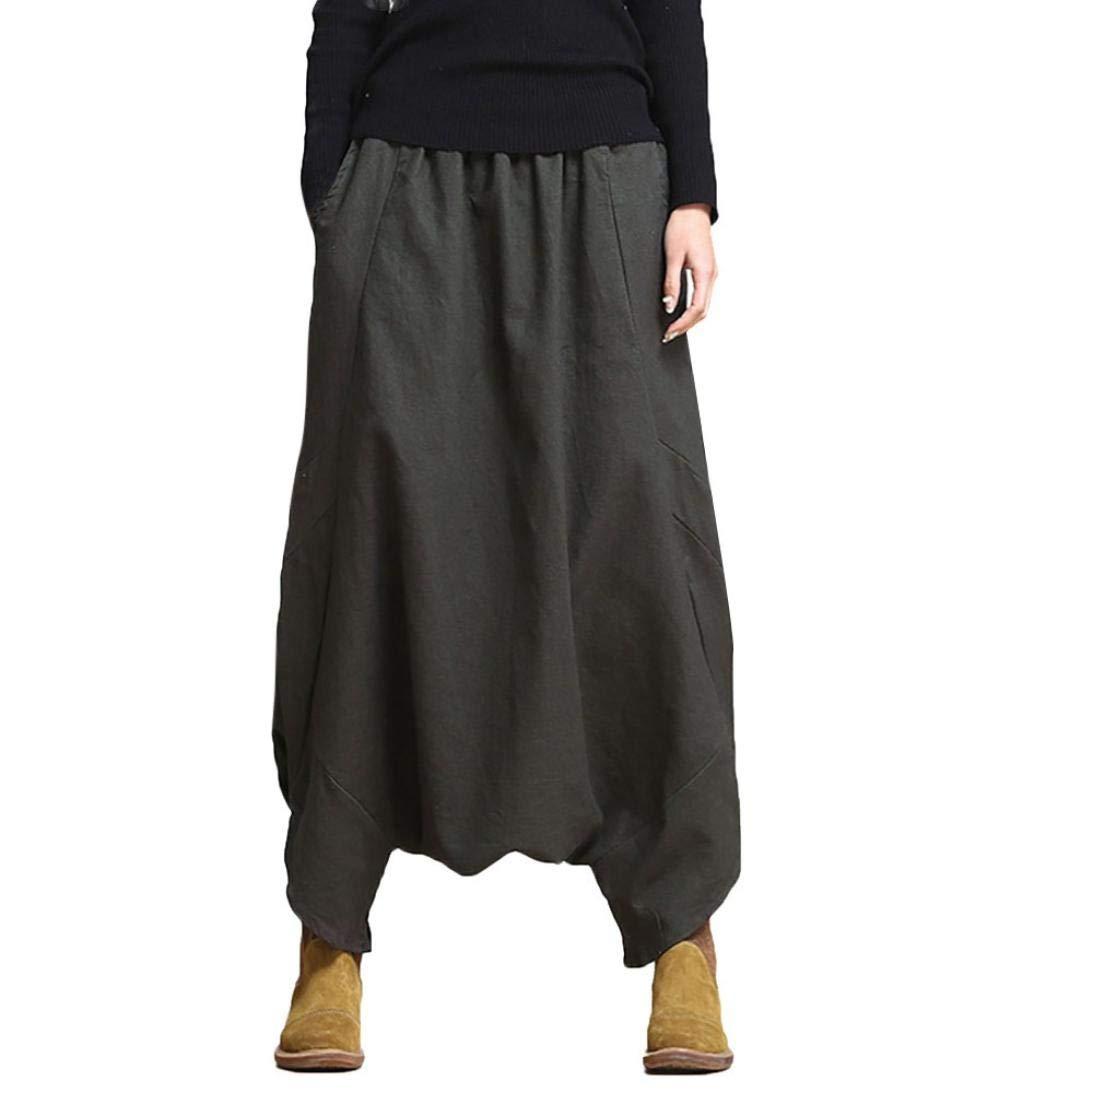 Women's Cotton Linen Baggy Boho Retro Yoga Harem Pants Muranba